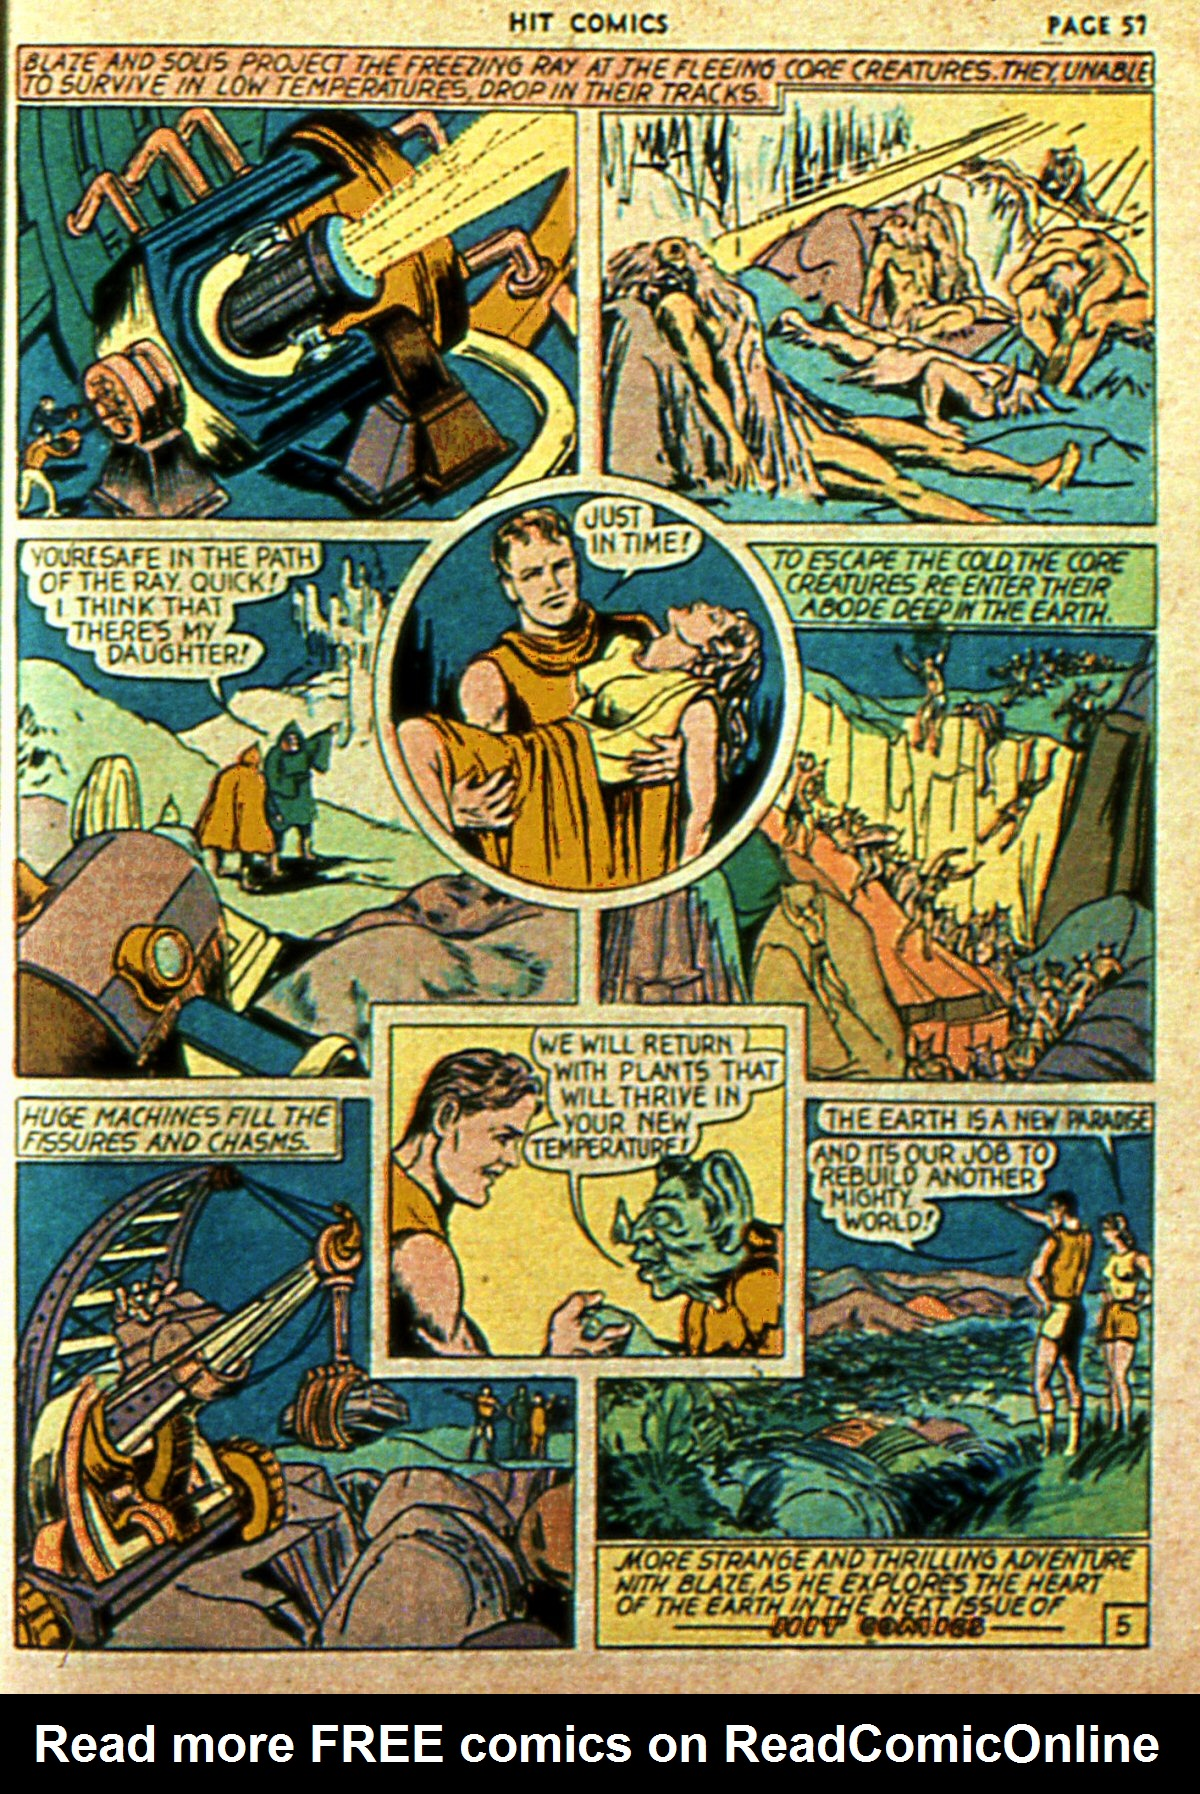 Read online Hit Comics comic -  Issue #2 - 59